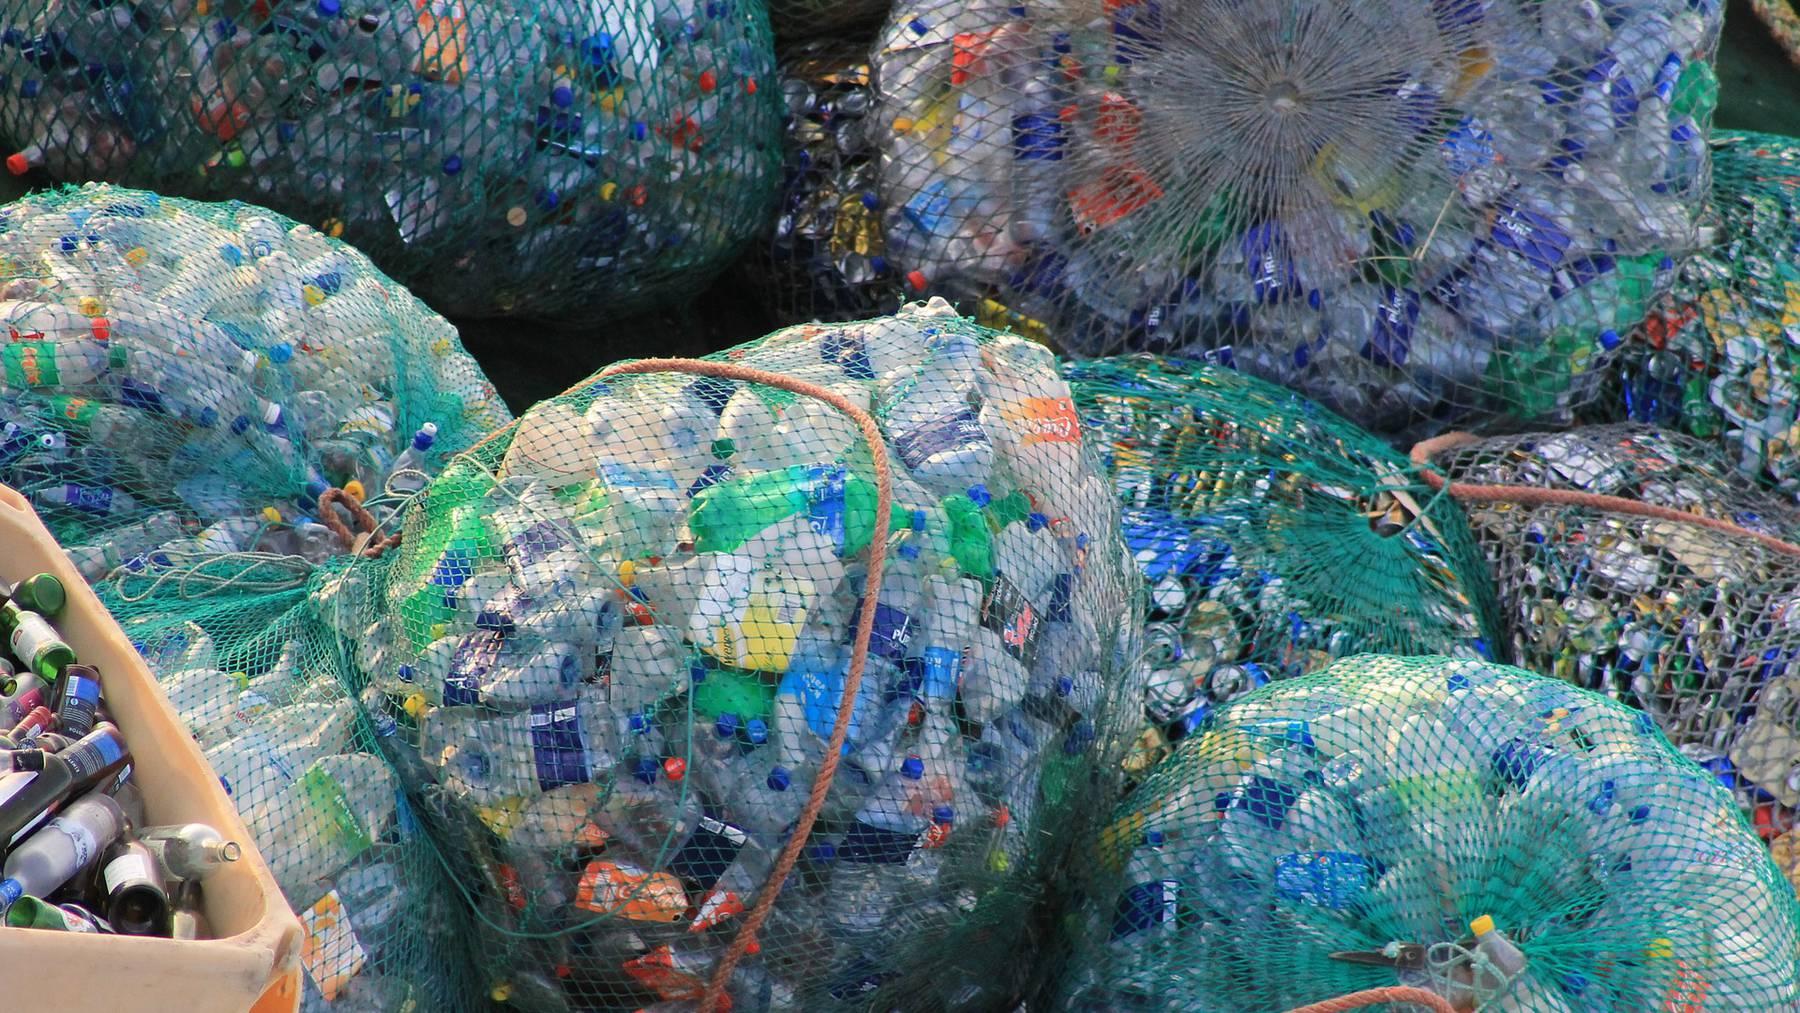 Knapp 3'000 neue Sammelstellen für Pet-Recycling